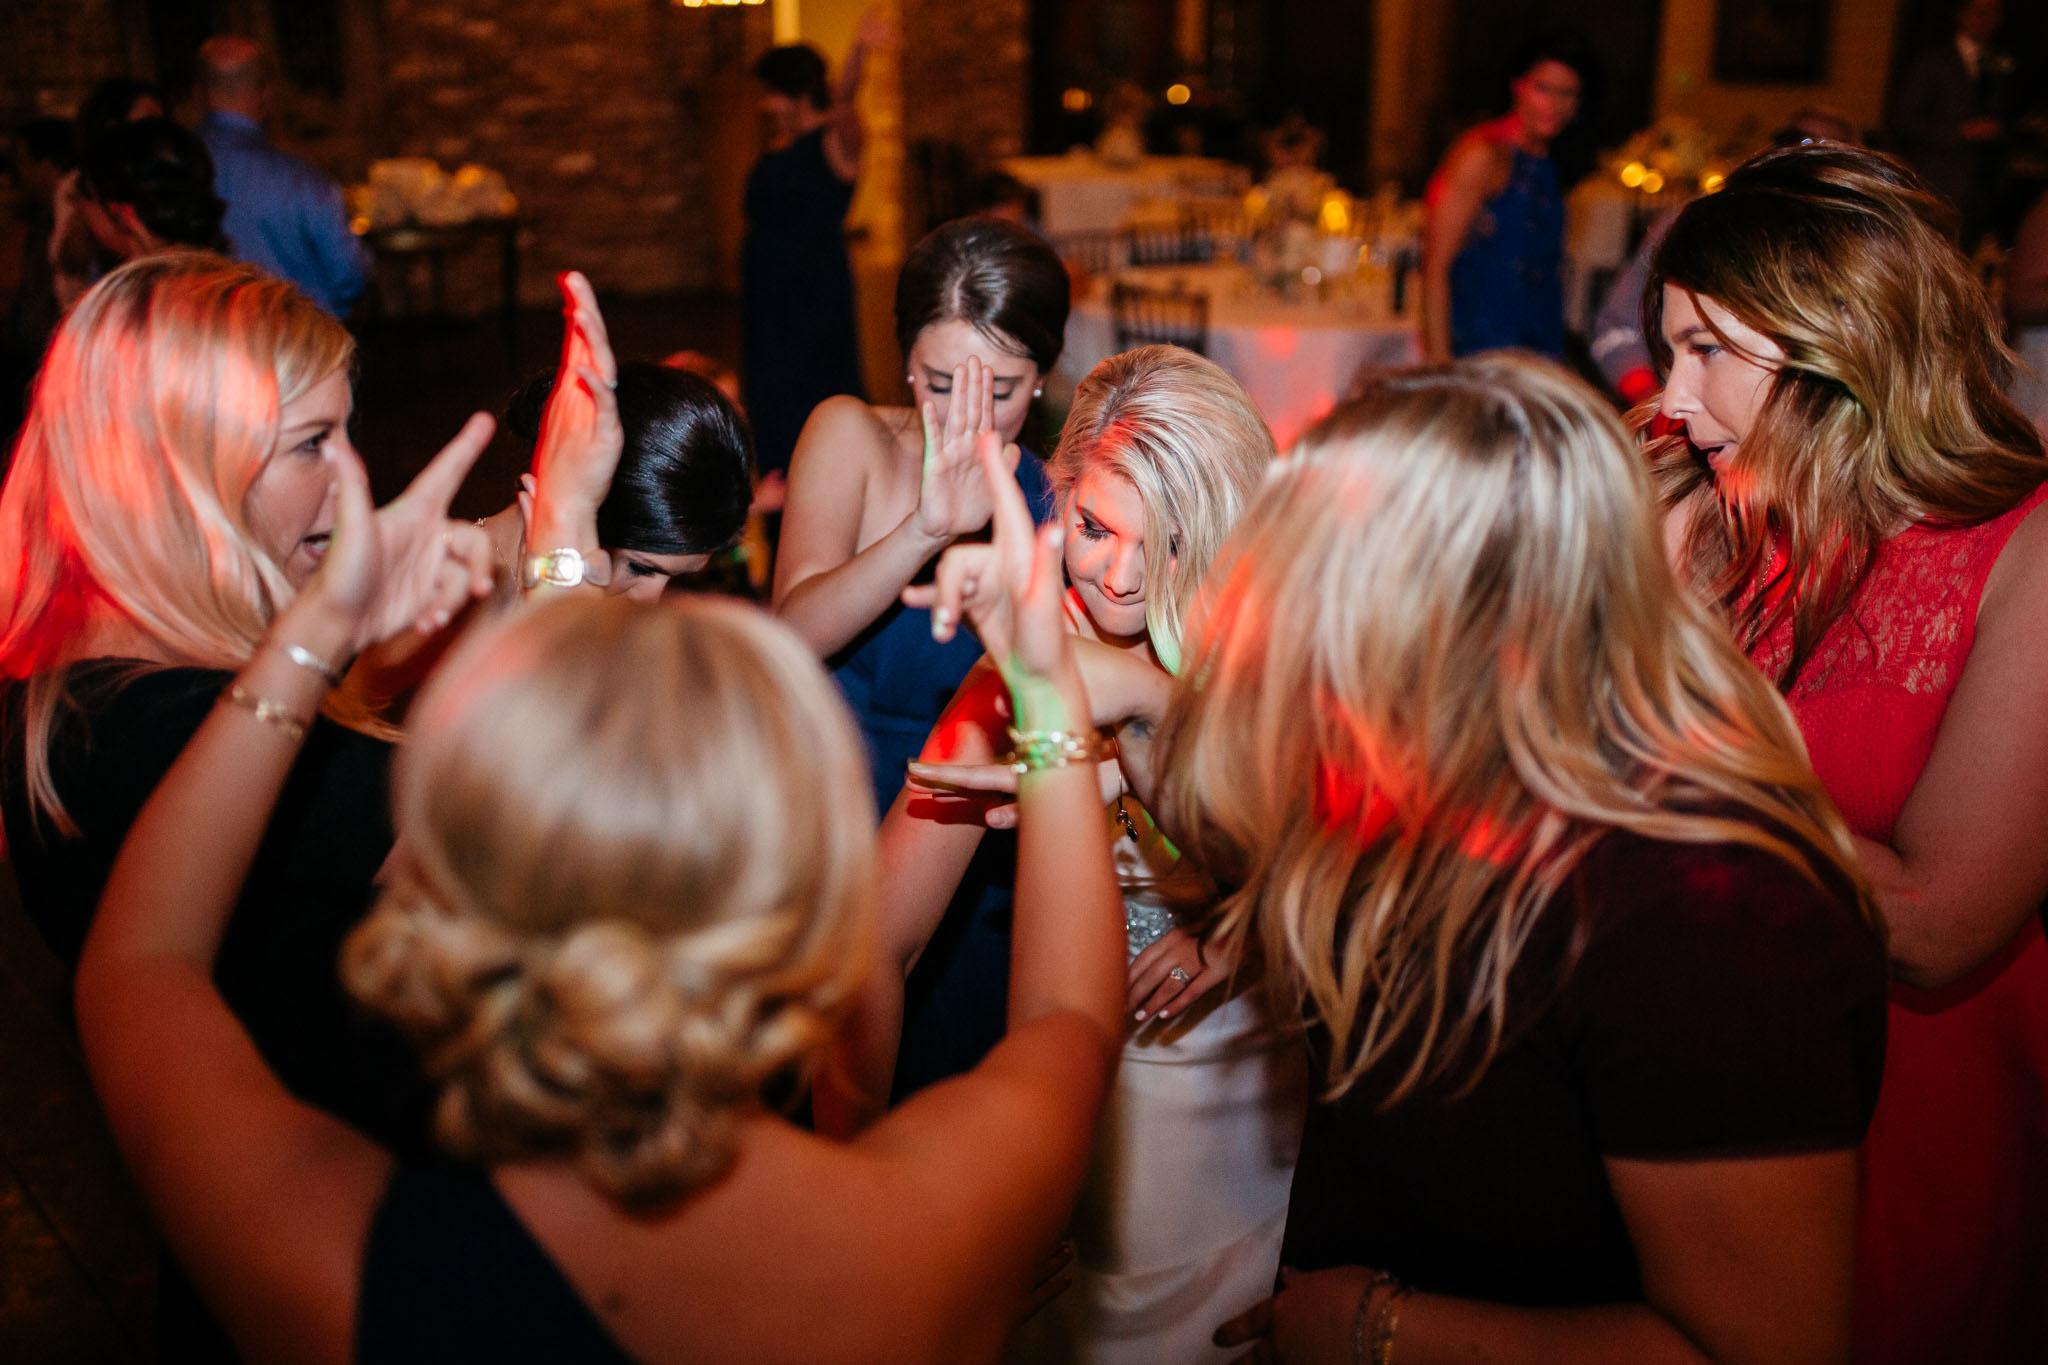 The Hatches   An Elegant Garden Wedding   Cedar Hall   Memphis Tennessee Wedding and Elopement Photographers   memphis-tennessee-utah-colorado-arizona-washington-wedding-elopement-photographer-garden-elegant-warm-summer-classic-romantic-floral-vintage-cake-table-reception